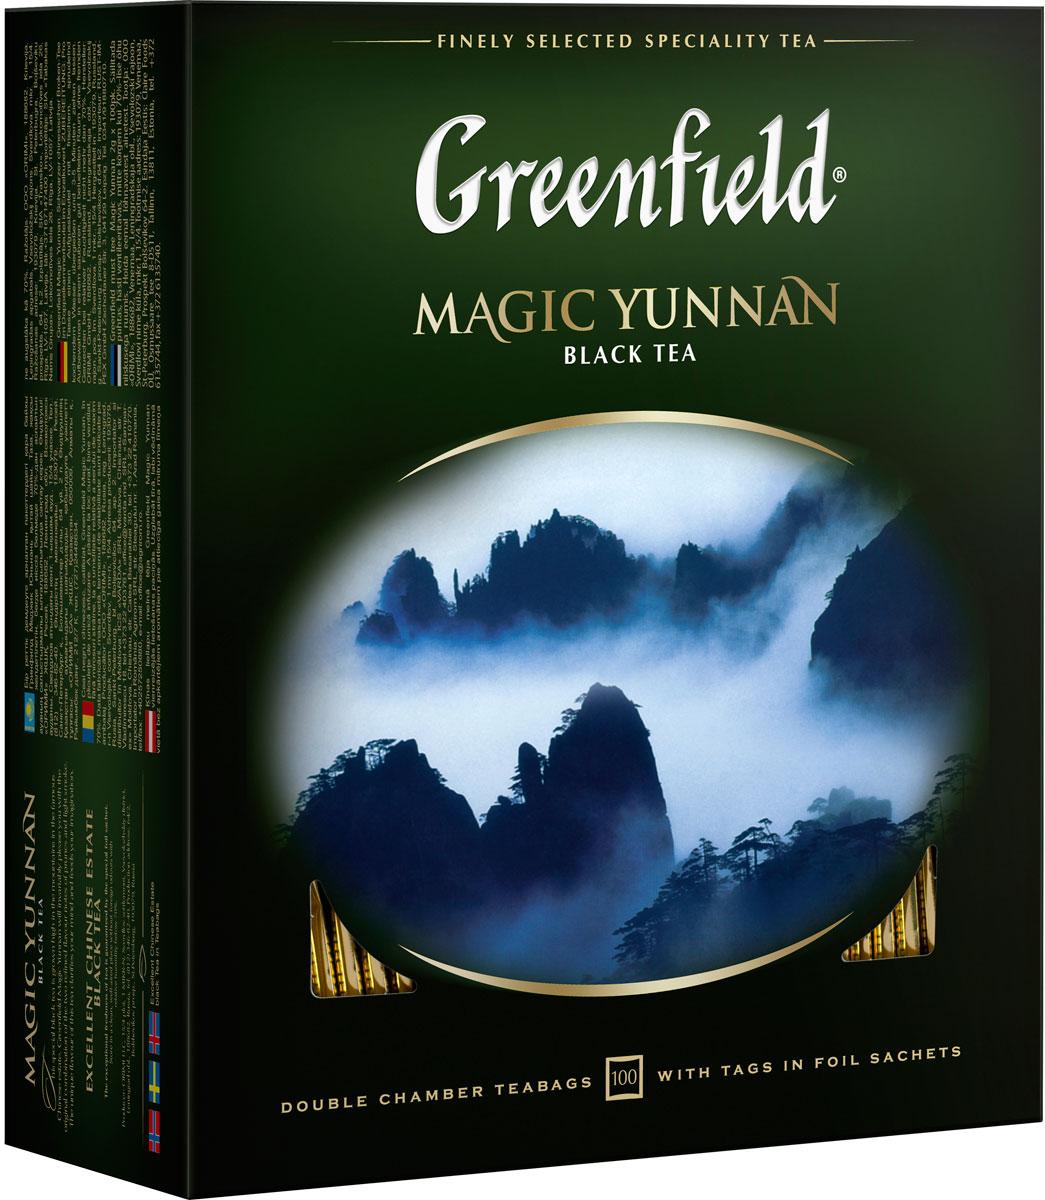 Greenfield Magic Yunnan черный чай в пакетиках, 100 шт greenfield honey linden черный чай с липой и медом в пакетиках 25 шт